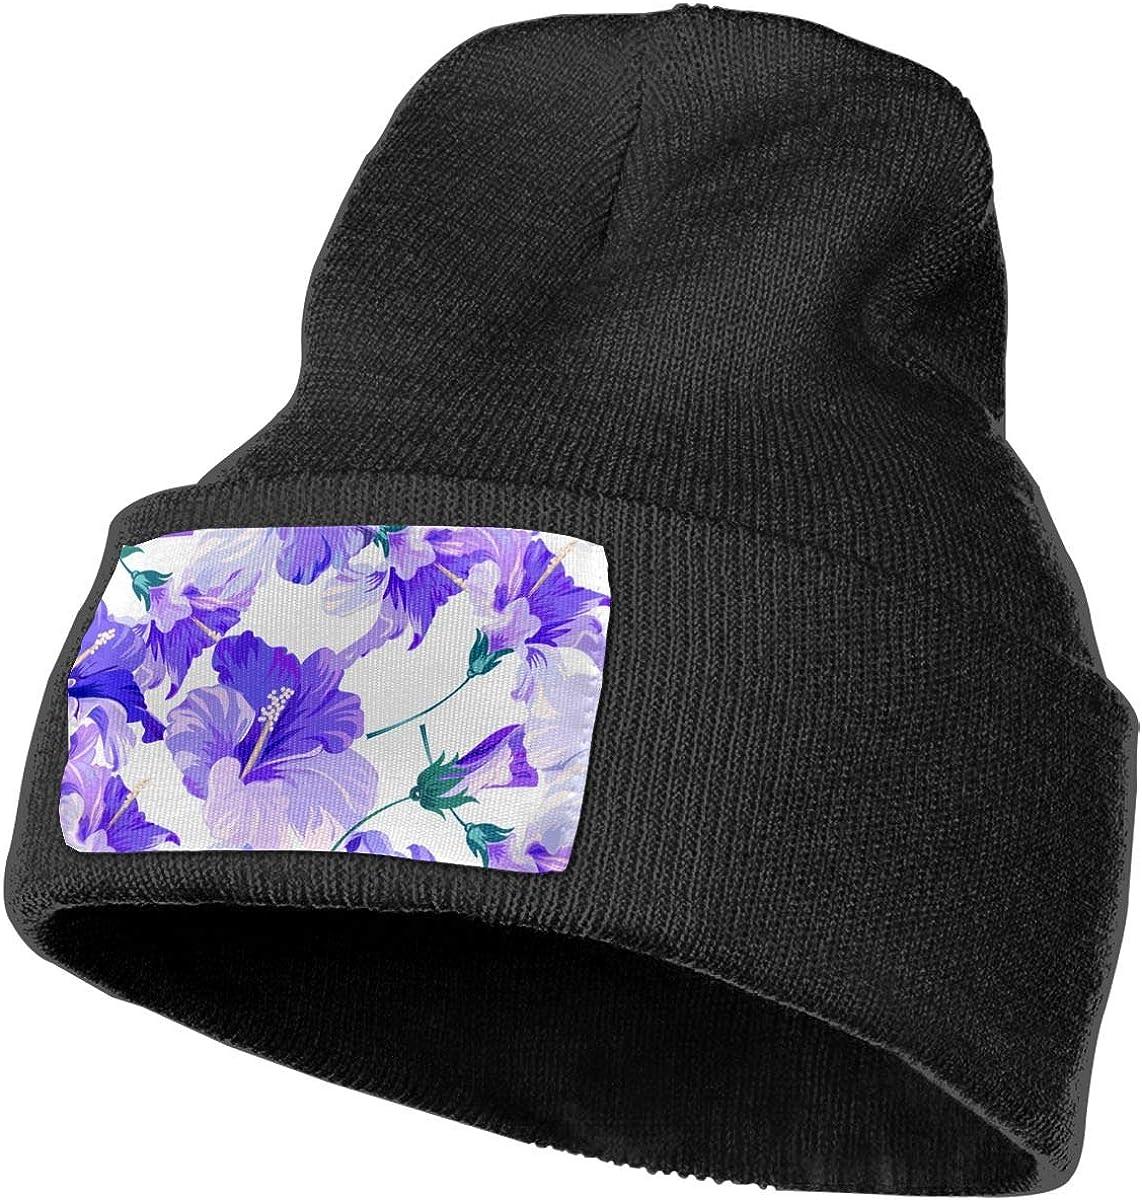 QZqDQ Beautiful Orchids Unisex Fashion Knitted Hat Luxury Hip-Hop Cap